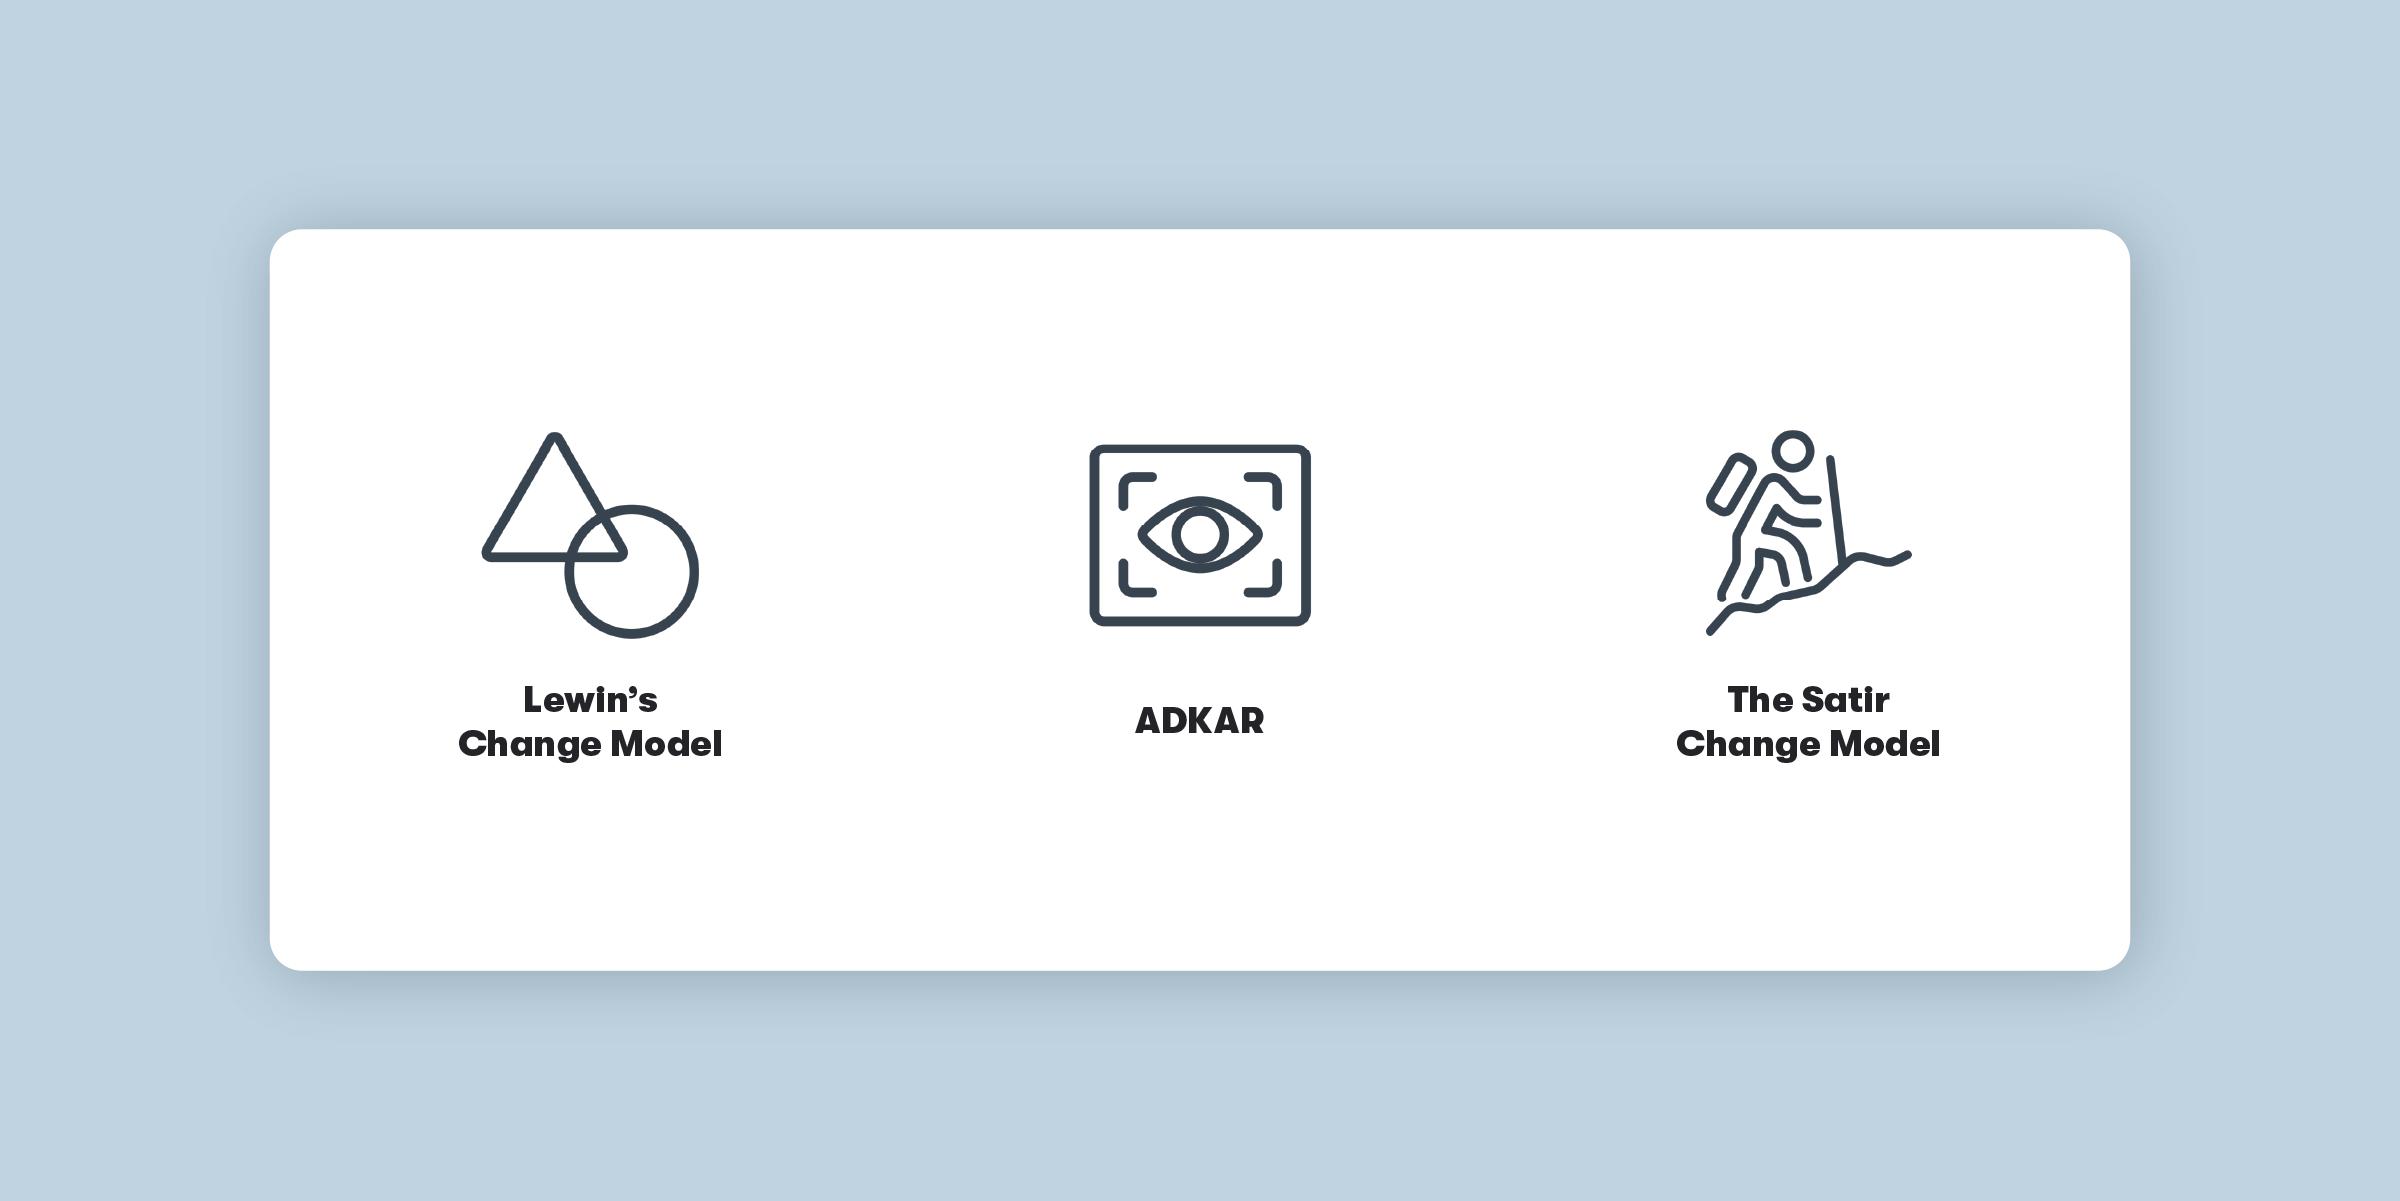 Images for each change model